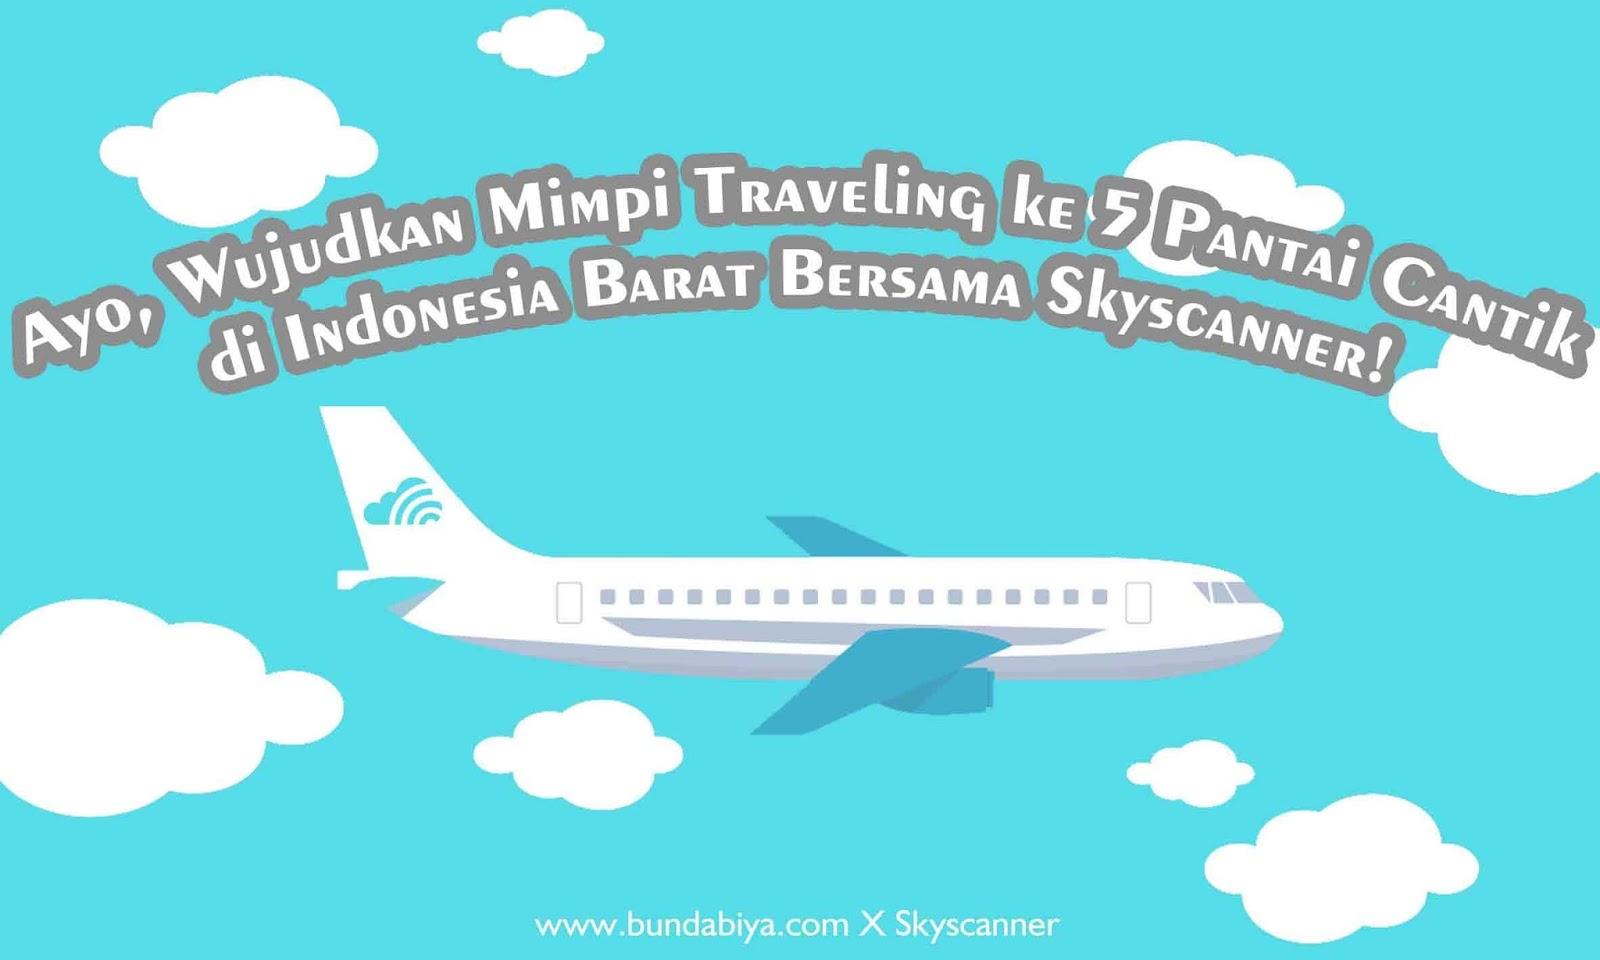 tiket pesawat, tiket pesawat garuda, skyscanner, tiket pesawat garuda indonesia, pantai di indonesia barat, pantai di belitung, pantai laskar pelangi, jelajah nusantara bersama skyscanner